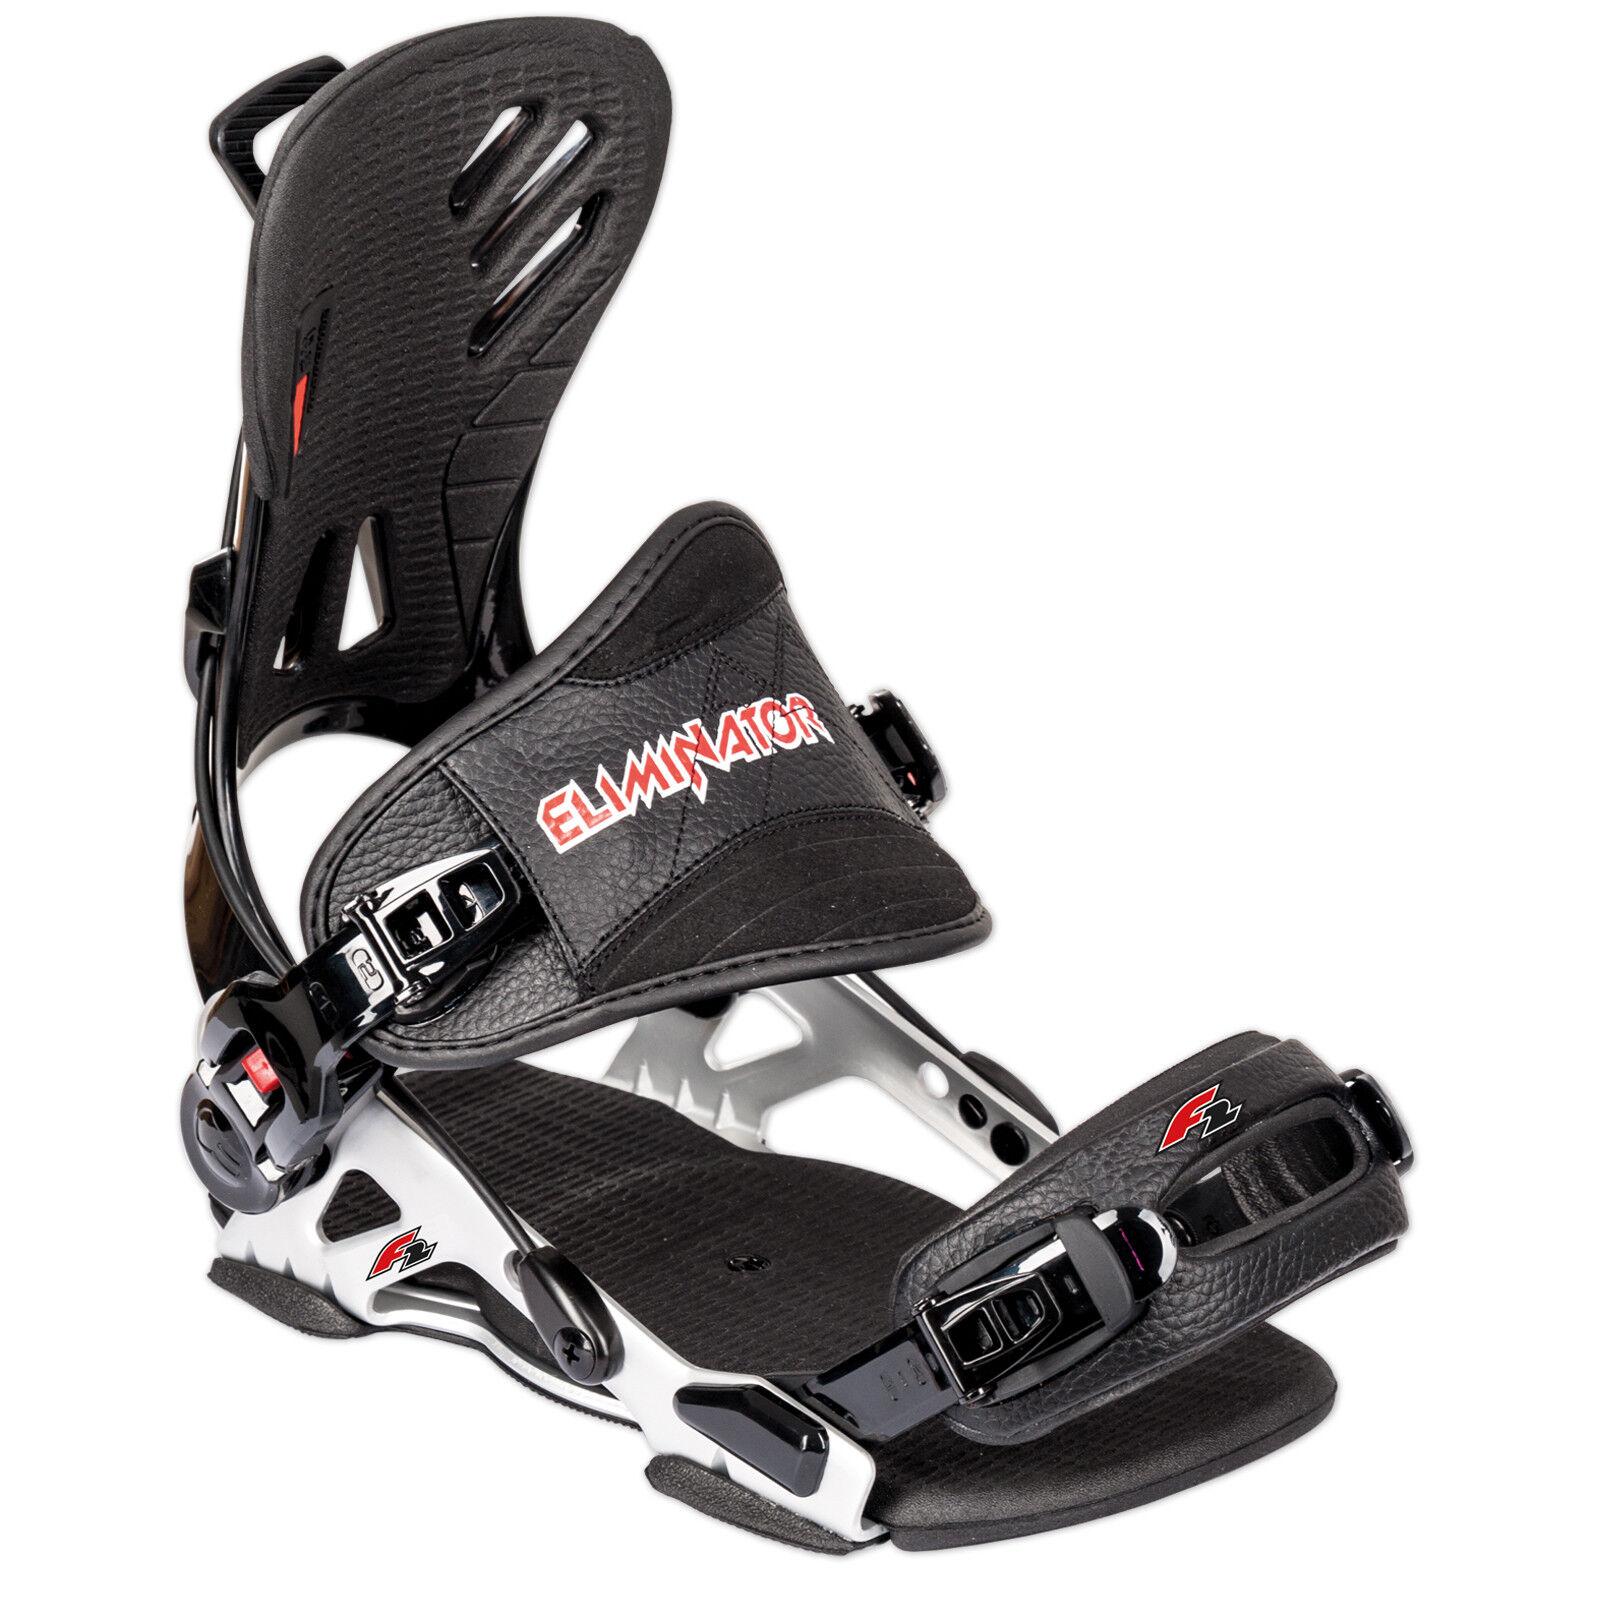 F2 Eliminator voitureve Fastec Fixation 2019  Snowboard Softdémarrage Fixation Taille XL